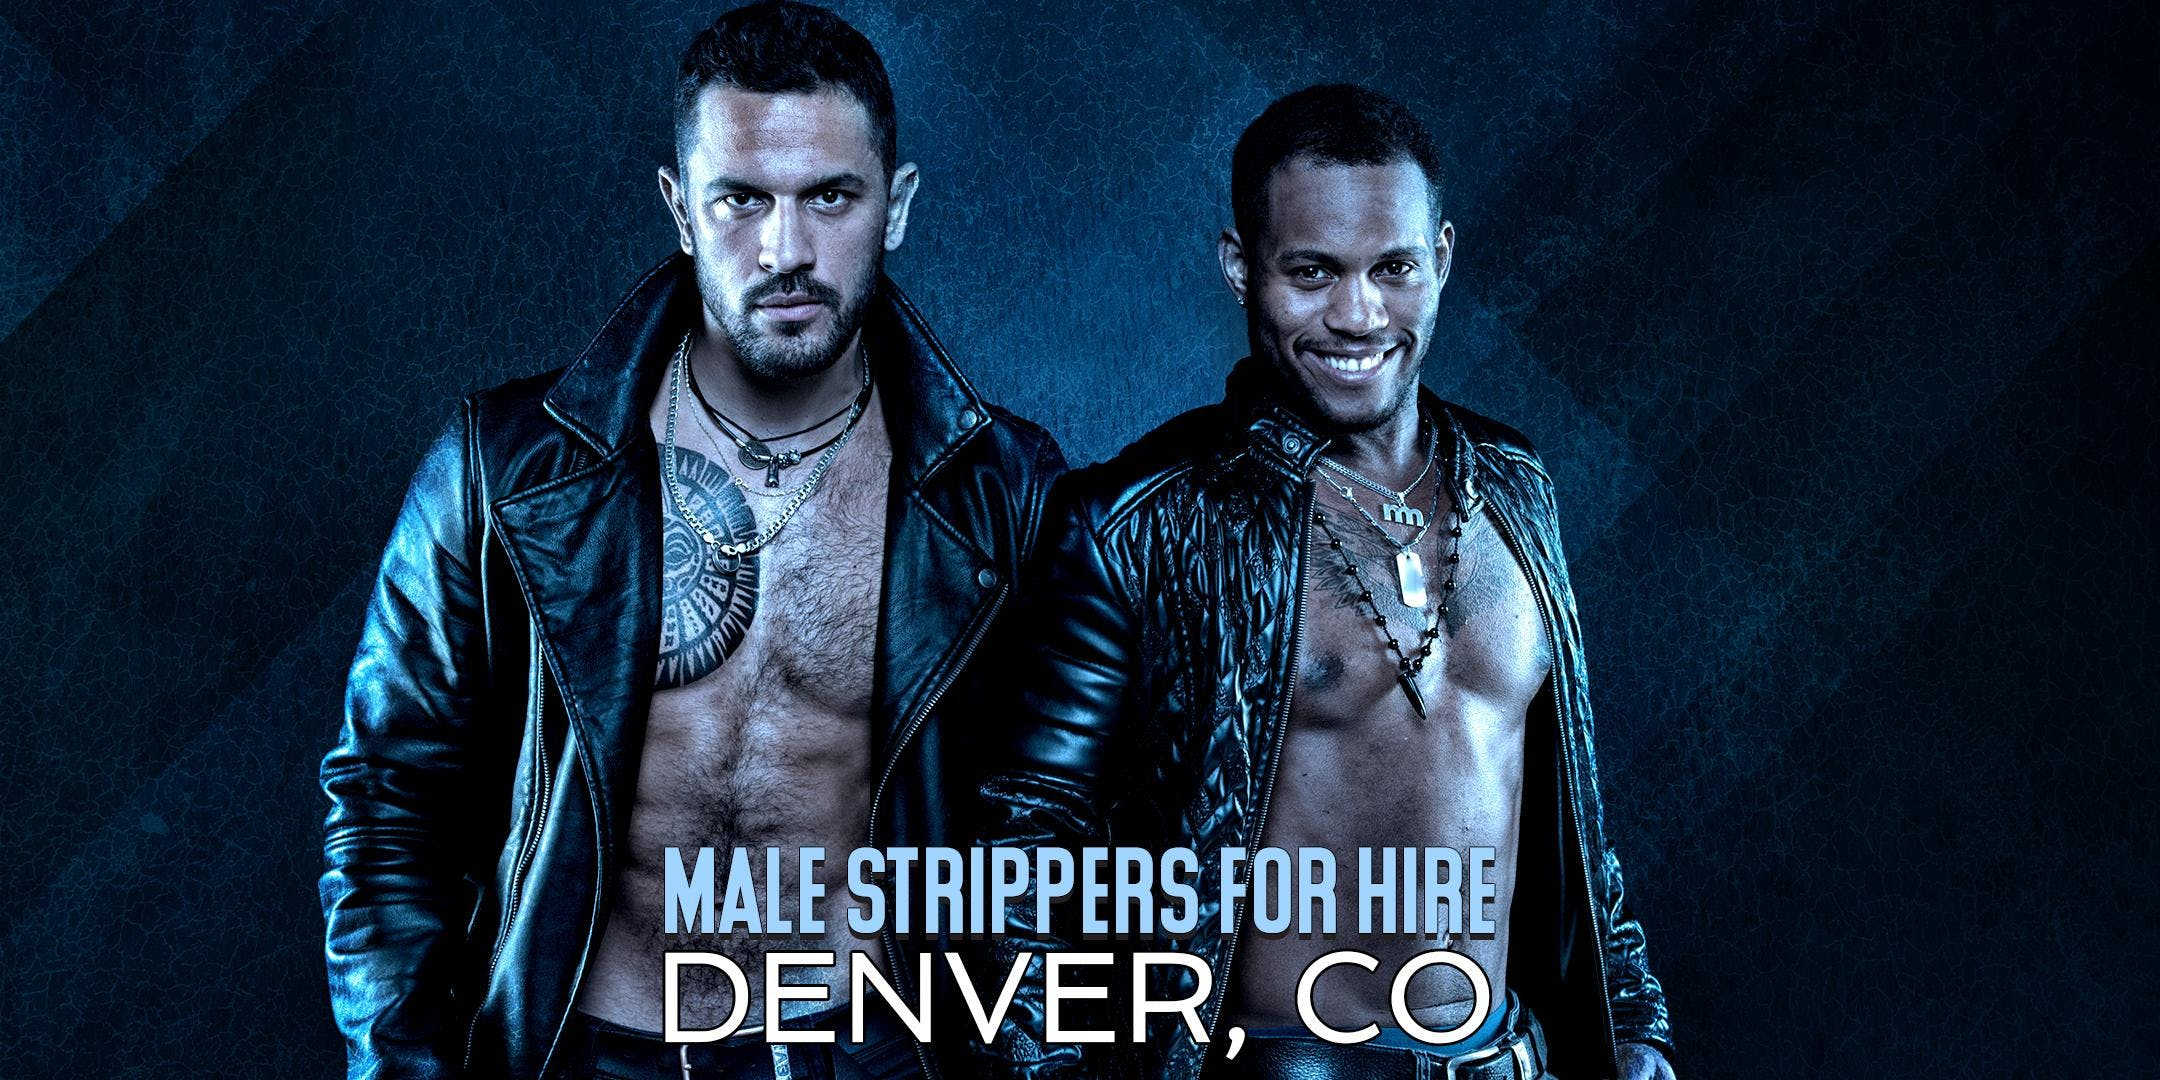 Hire a Male Stripper Denver CO - Private Part